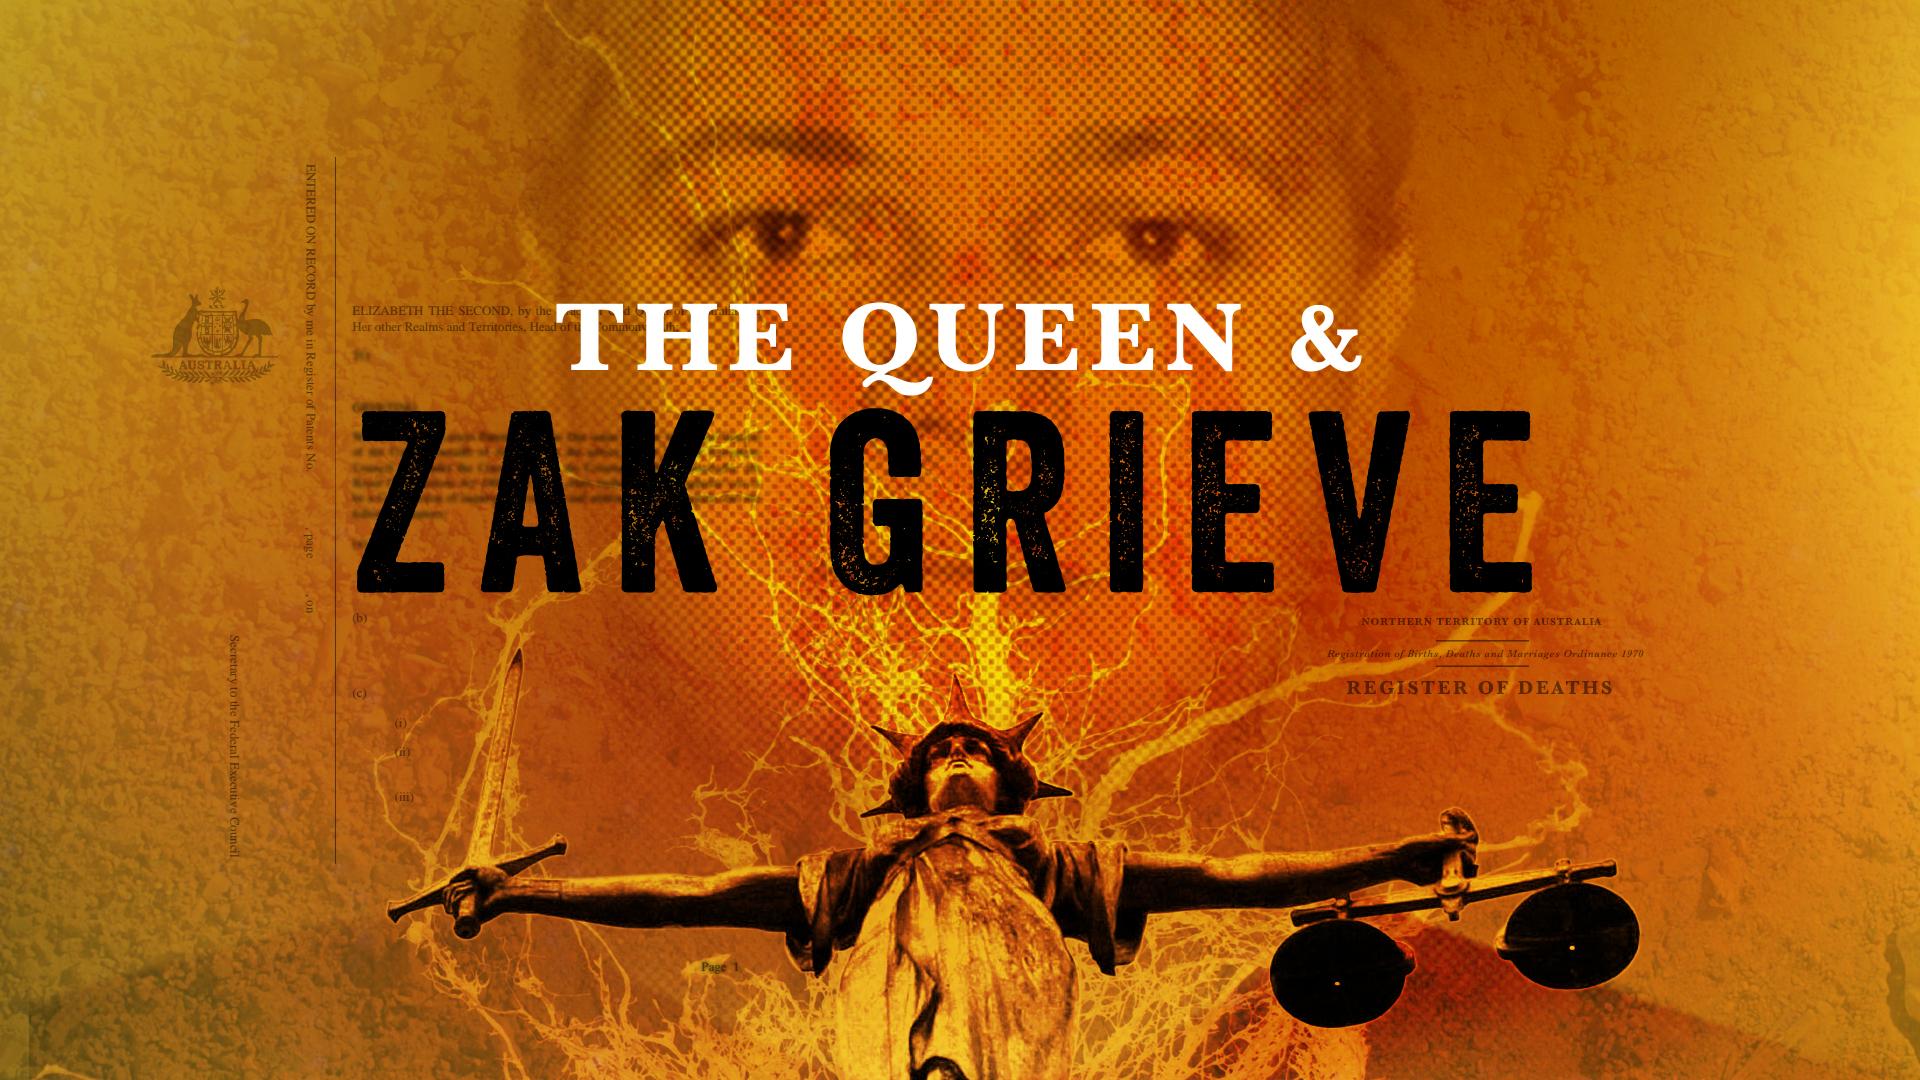 THE QUEEN & ZAK GRIEVE (2016)